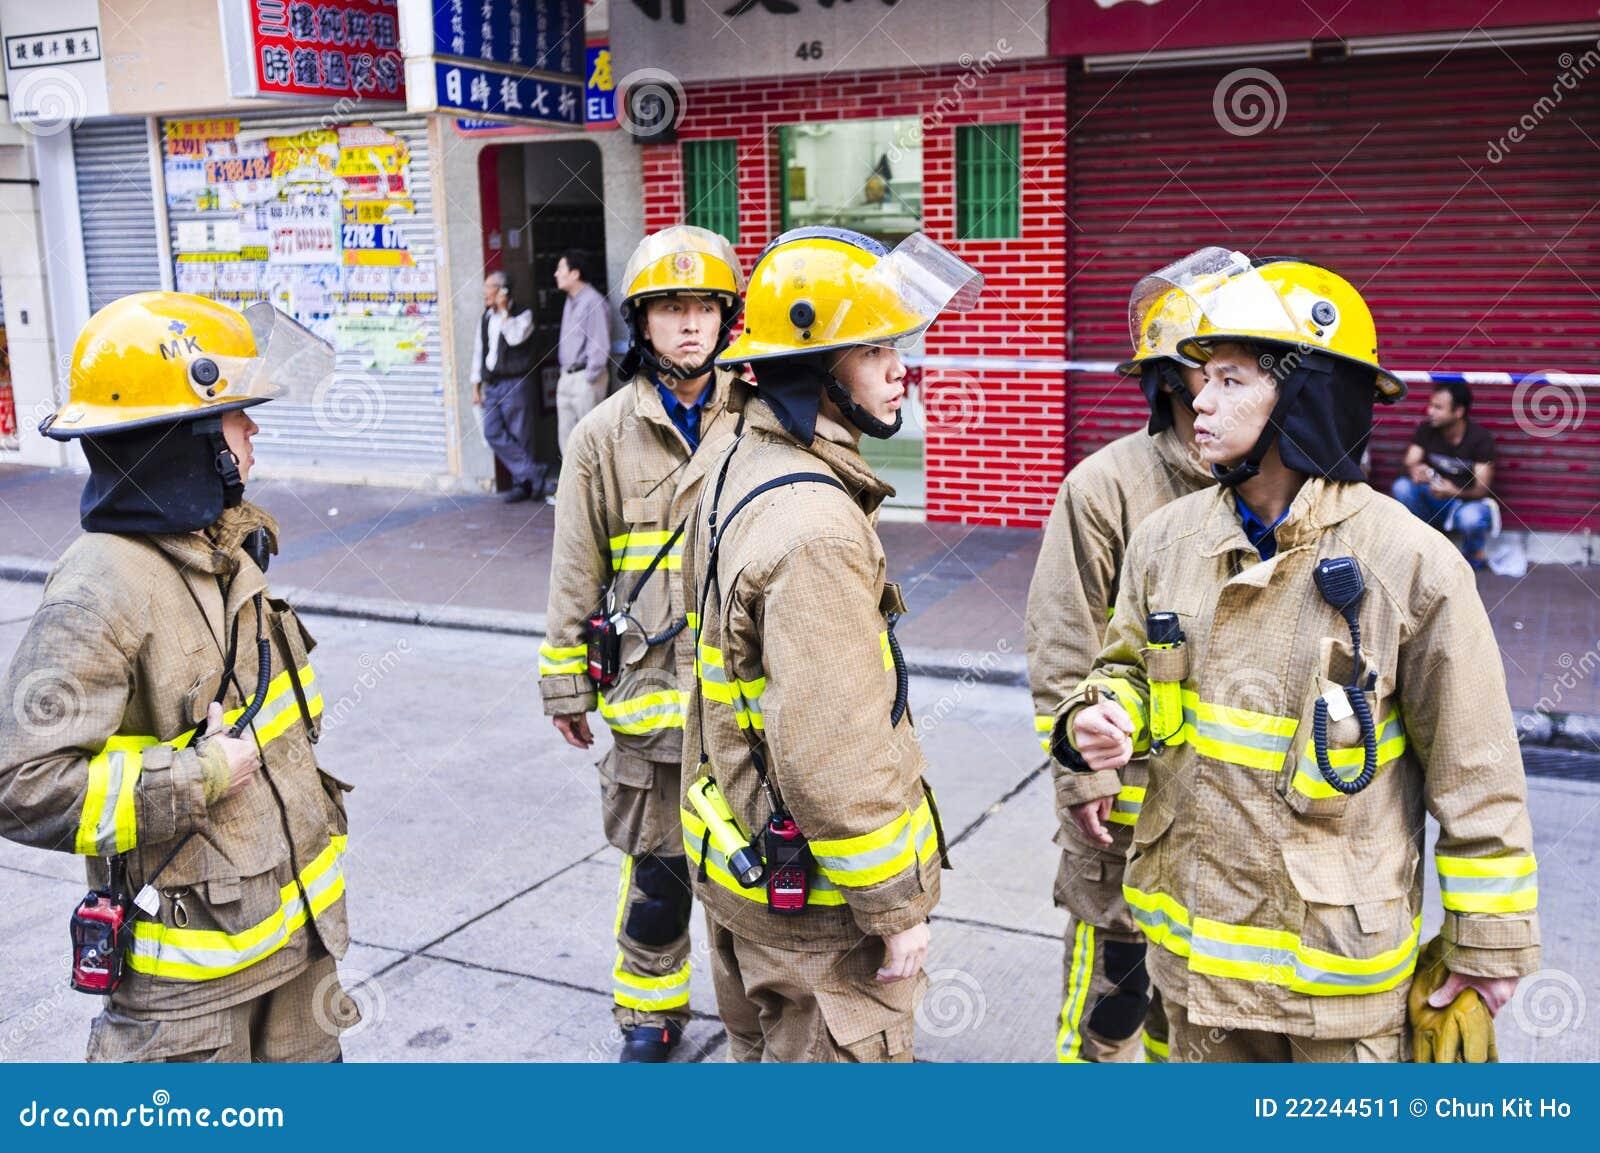 Hong Kong Firefighter Editorial Photo - Image: 22244511